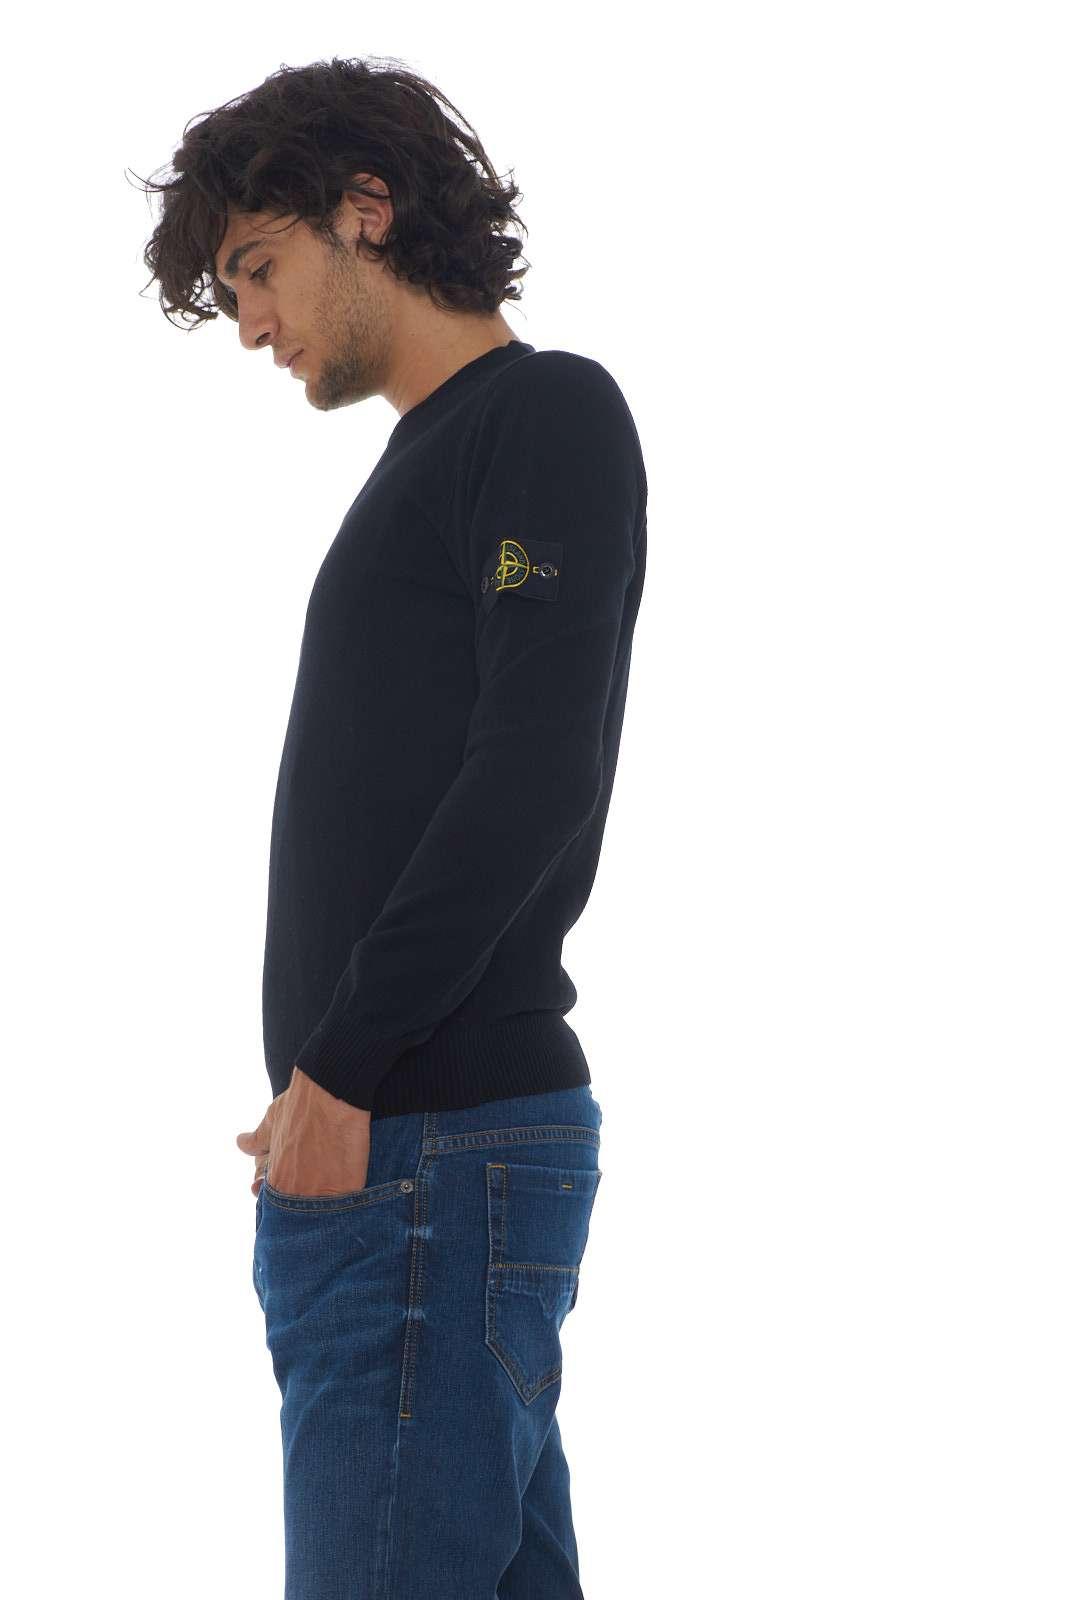 https://www.parmax.com/media/catalog/product/a/i/AI-outlet_parmax-maglia-uomo-Stone-Island-7115591A1-B.jpg